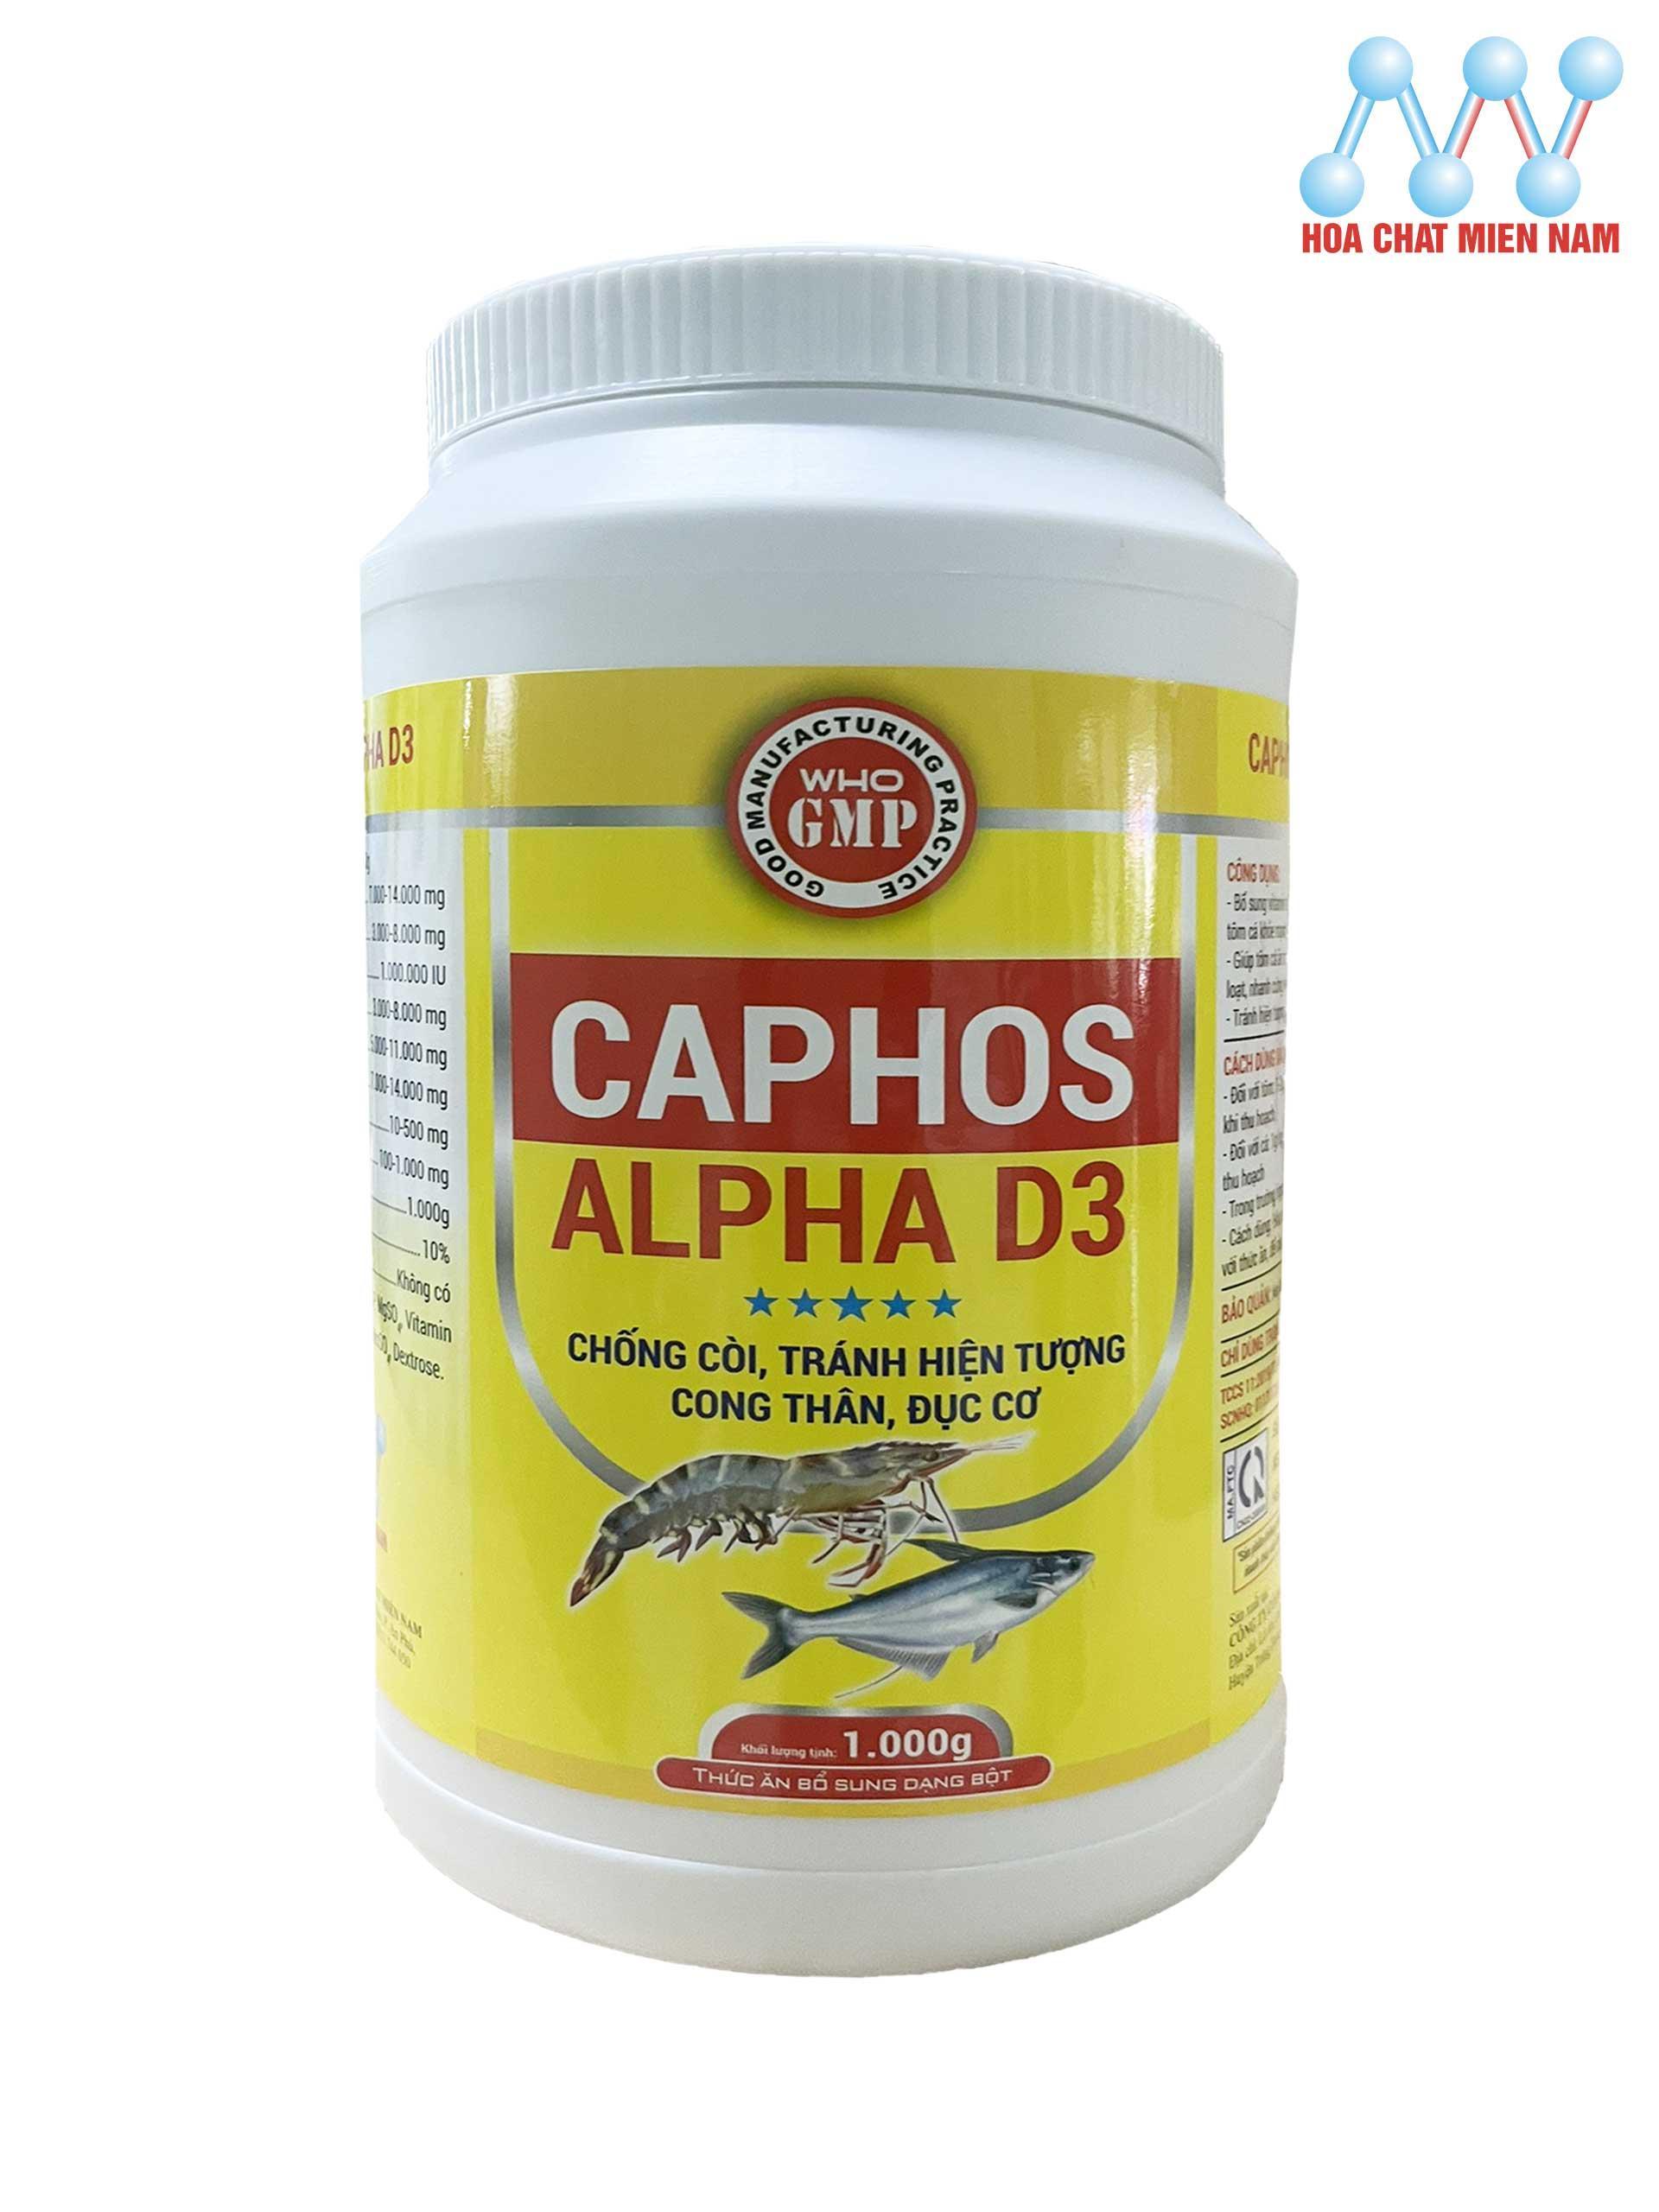 Hóa chất CAPHOS ALPHA D3